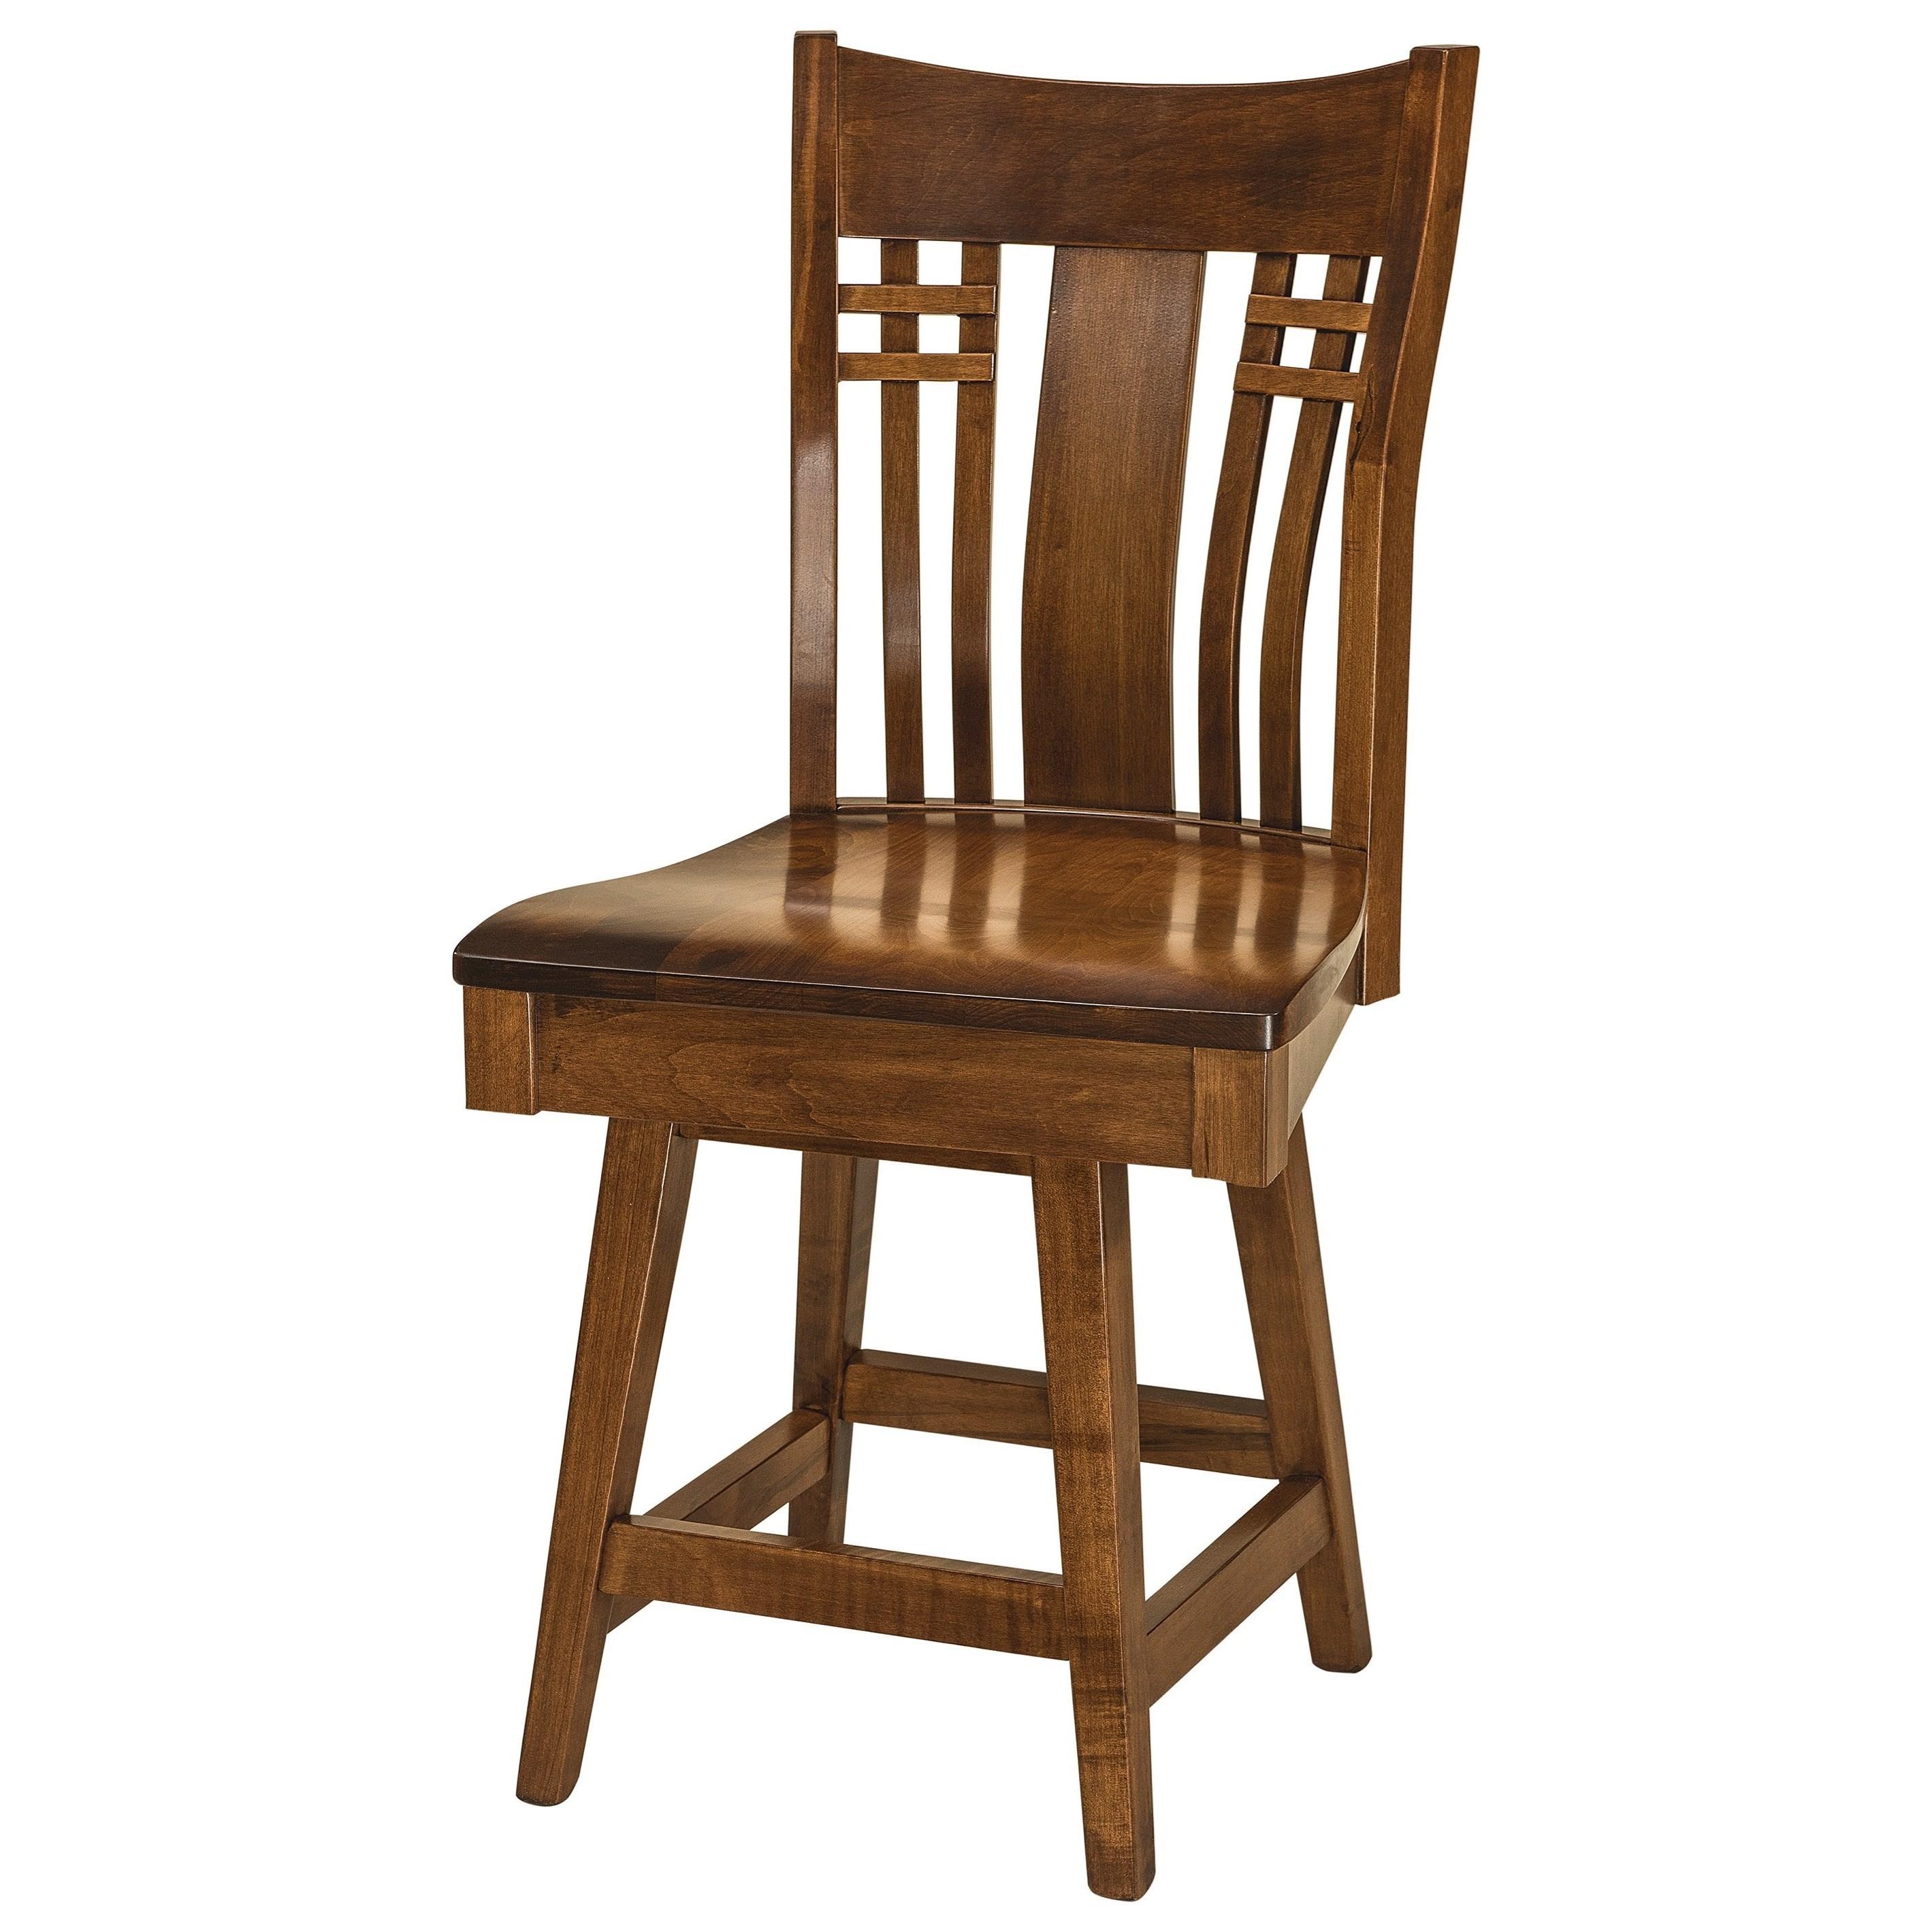 Swivel Counter Height Stool - Wood Seat